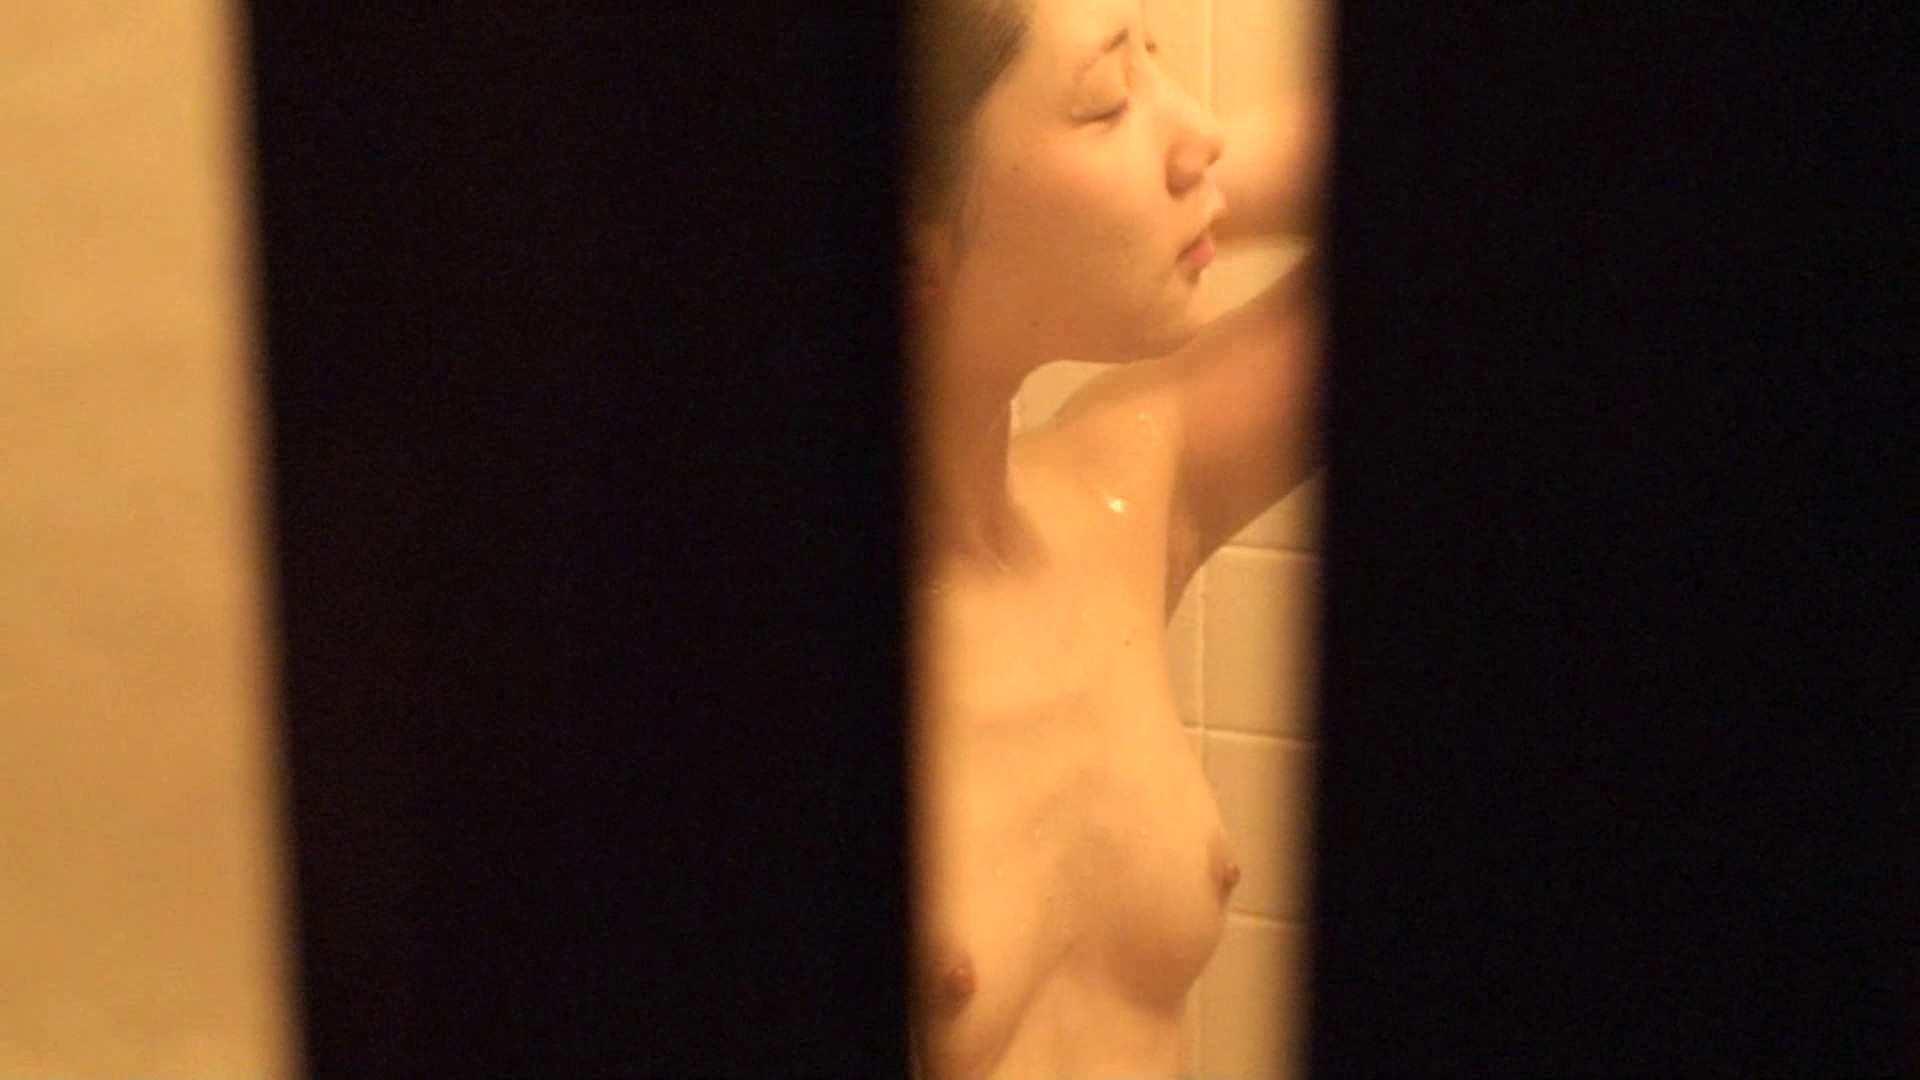 vol.02超可愛すぎる彼女の裸体をハイビジョンで!至近距離での眺め最高! 覗き ワレメ無修正動画無料 78pic 53